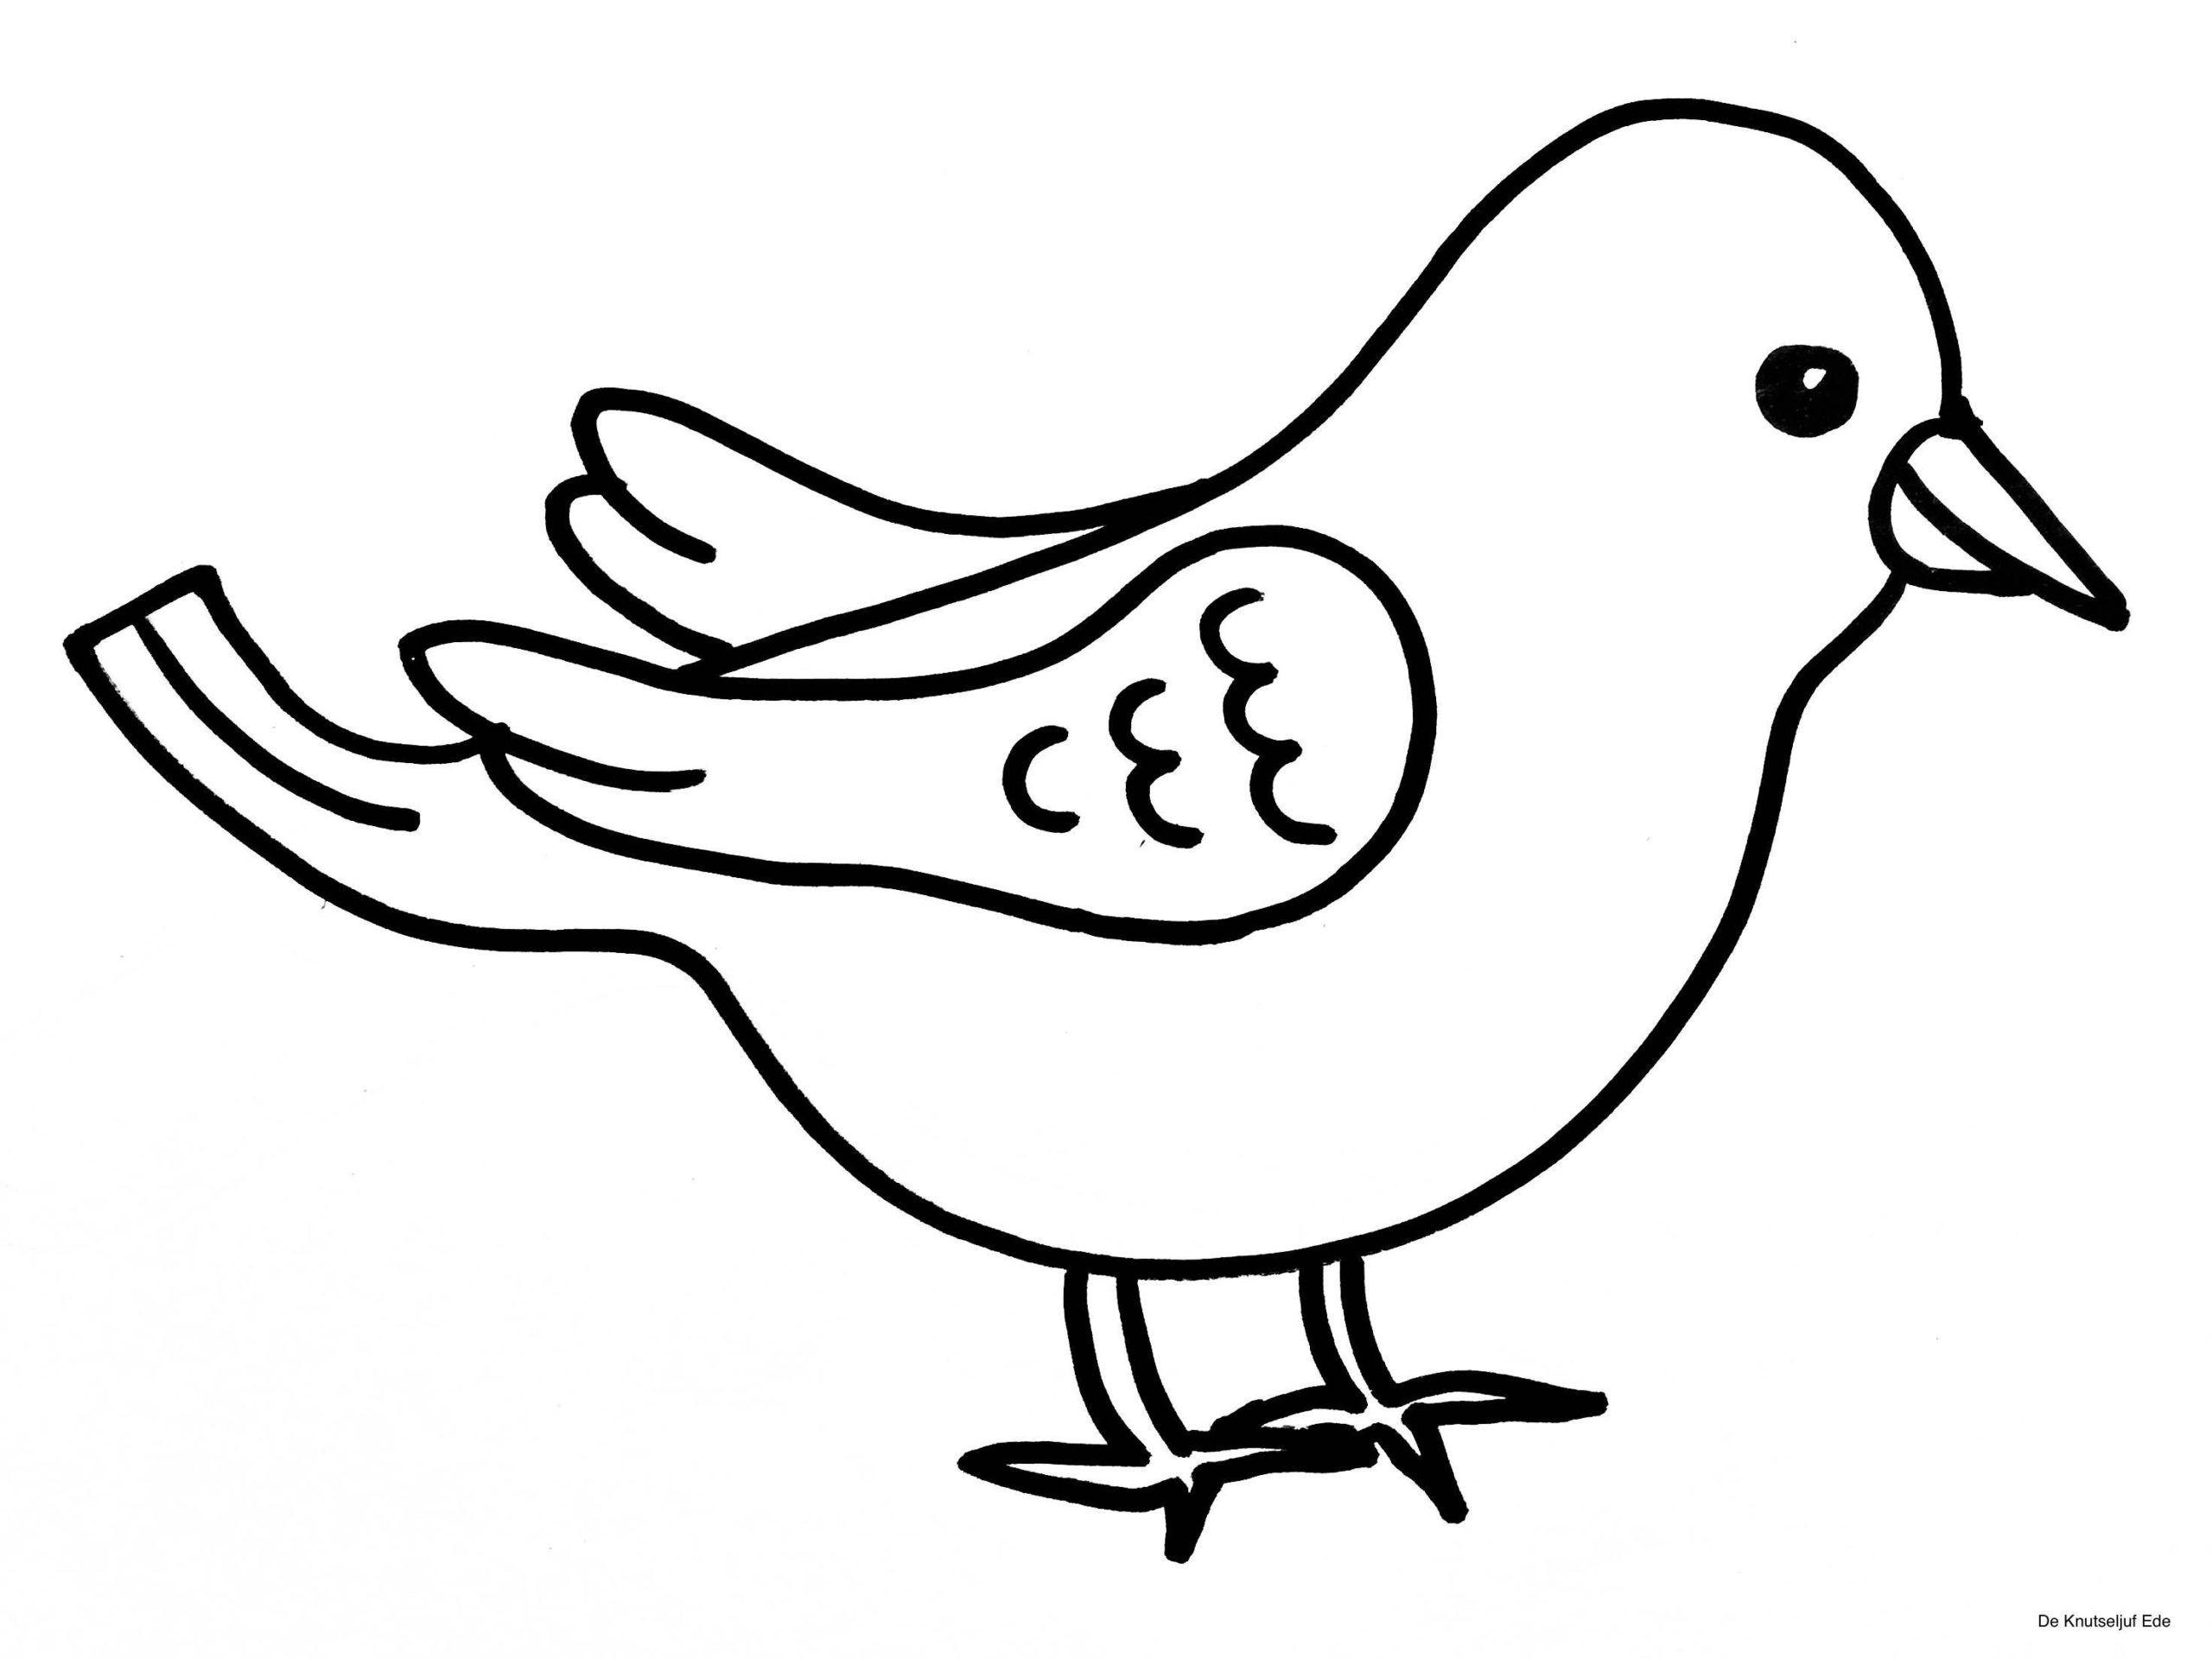 Vögel Färben Ausmalbilder Ausmalbilder Vögel Ausmalbilder für Malvorlagen Vögel